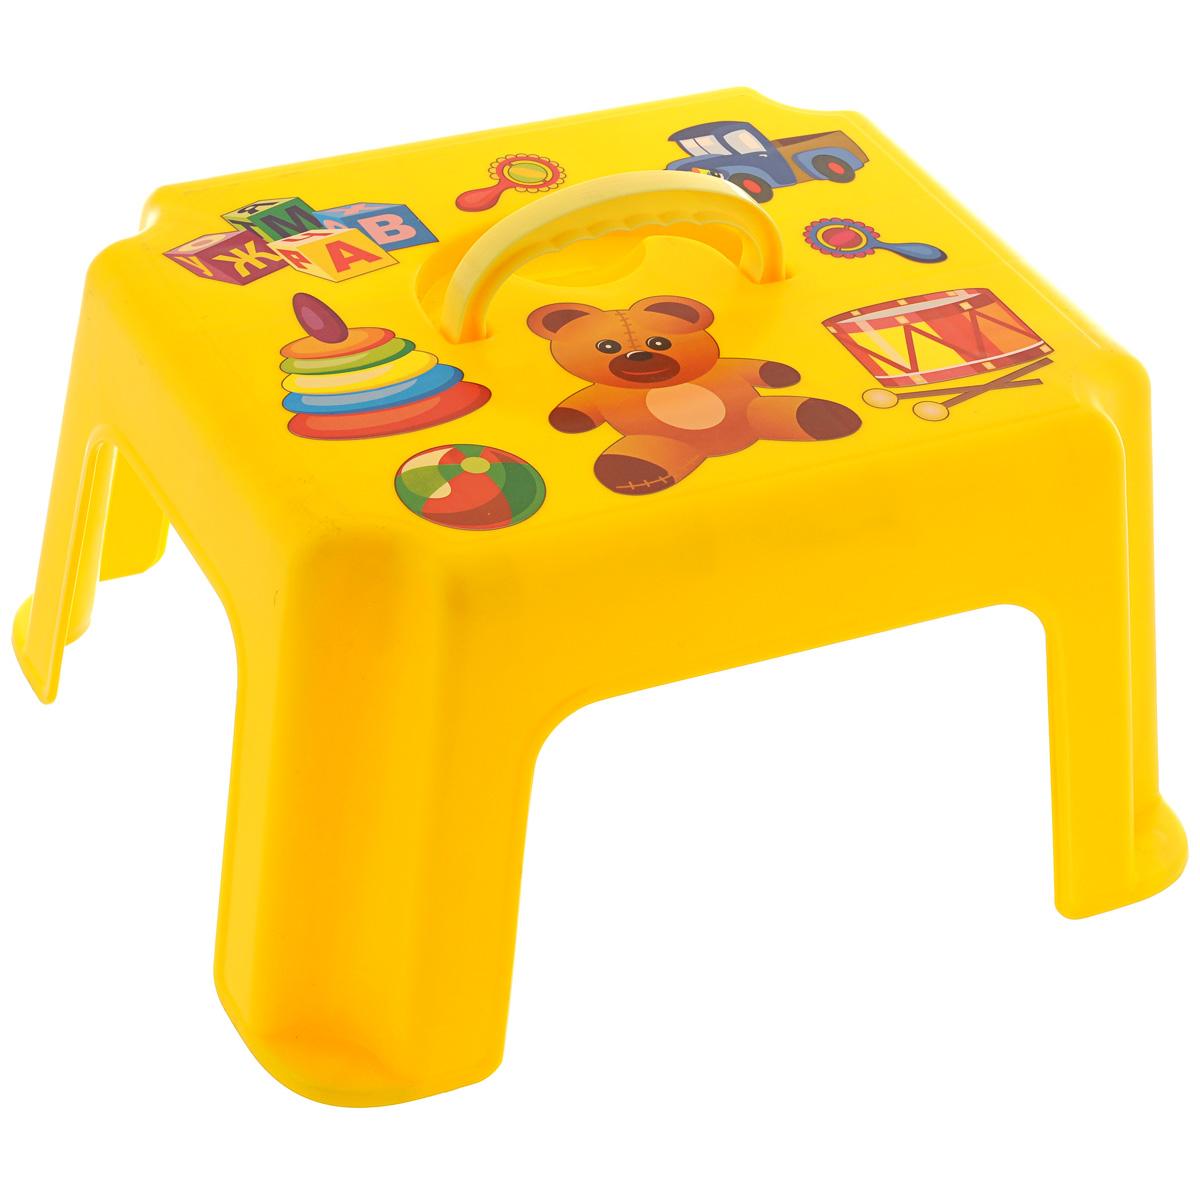 "Idea (М-пластика) Табурет-подставка детский ""Idea"", с ручкой, цвет: желтый М 2290_ желтый"